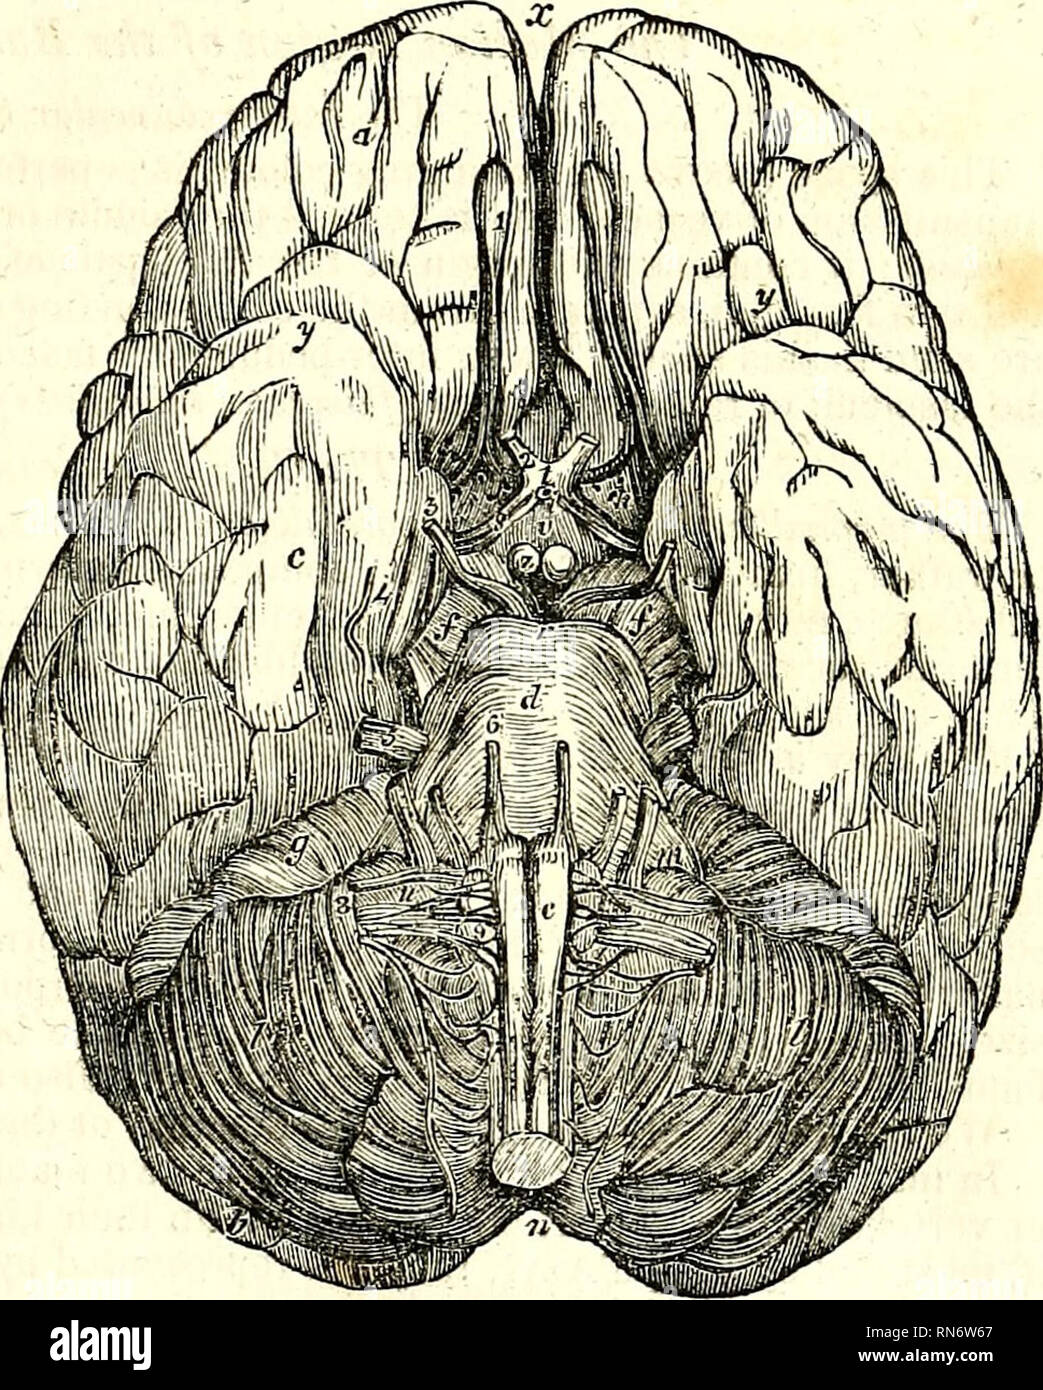 The Anatomy Of The Human Body Human Anatomy Anatomy The Base Of